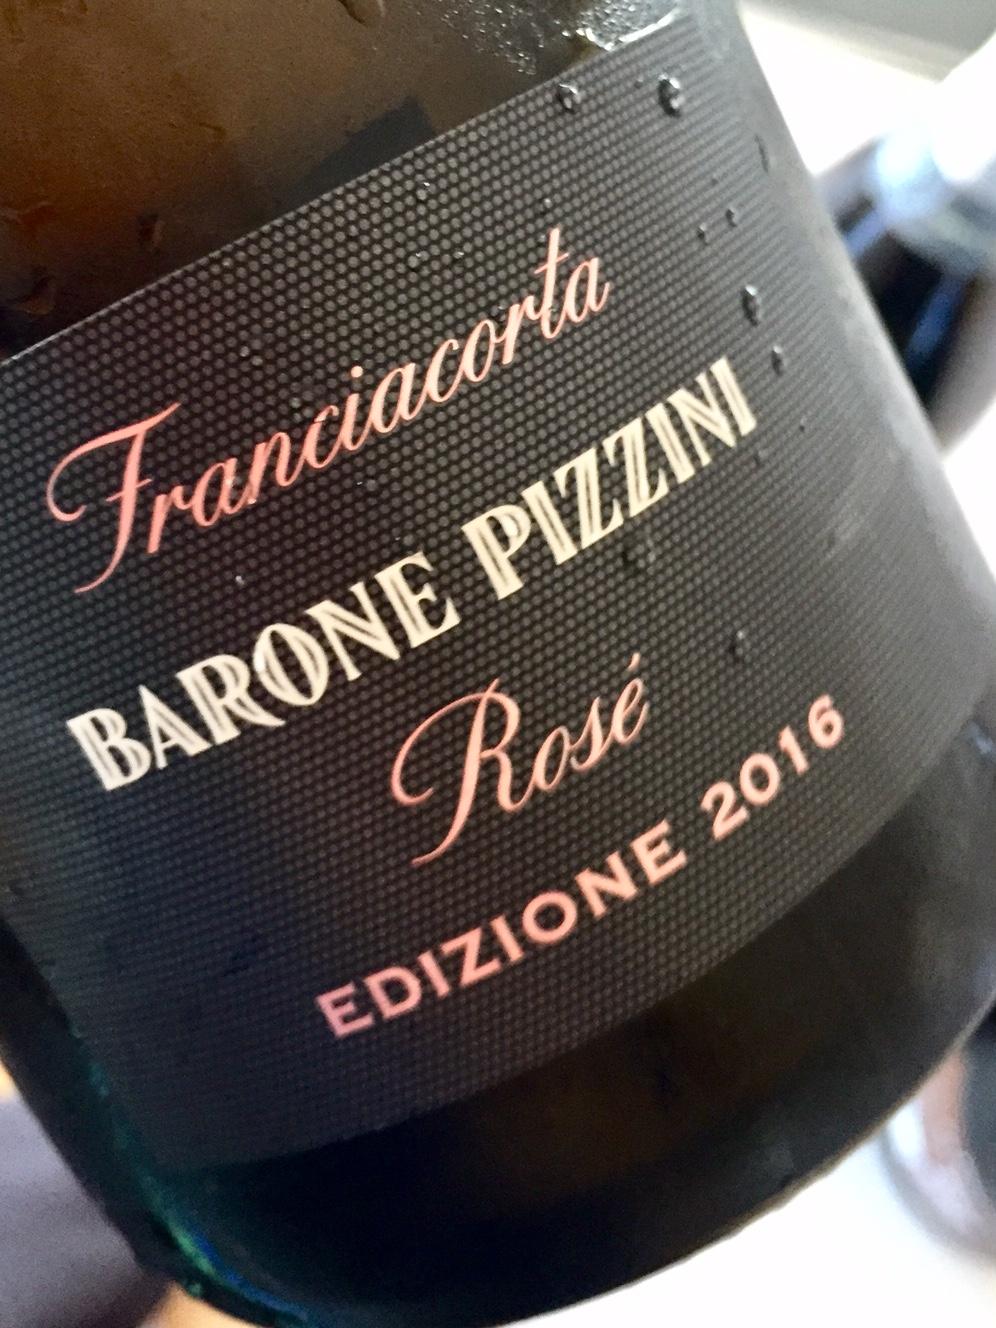 Rosé 2016 Barone Pizzini